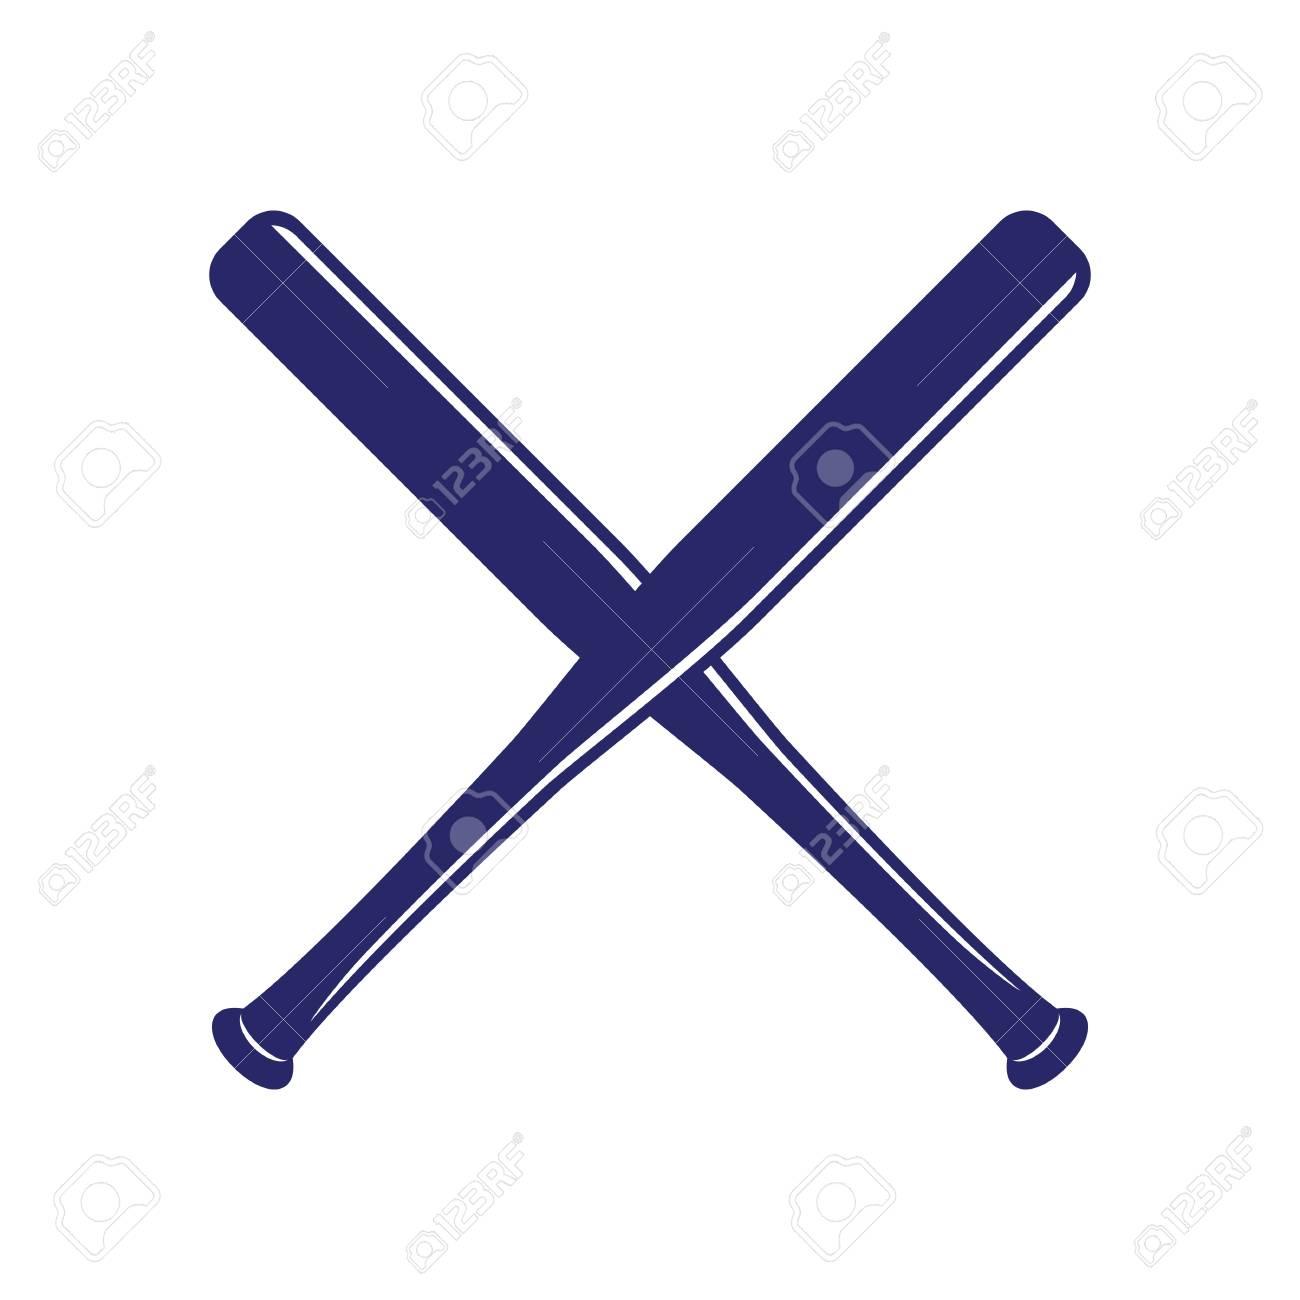 baseball crossed bats criss cross bats baseball flat vector rh 123rf com Crossed Bats with Flames Clip Art Crossed Bats SVG